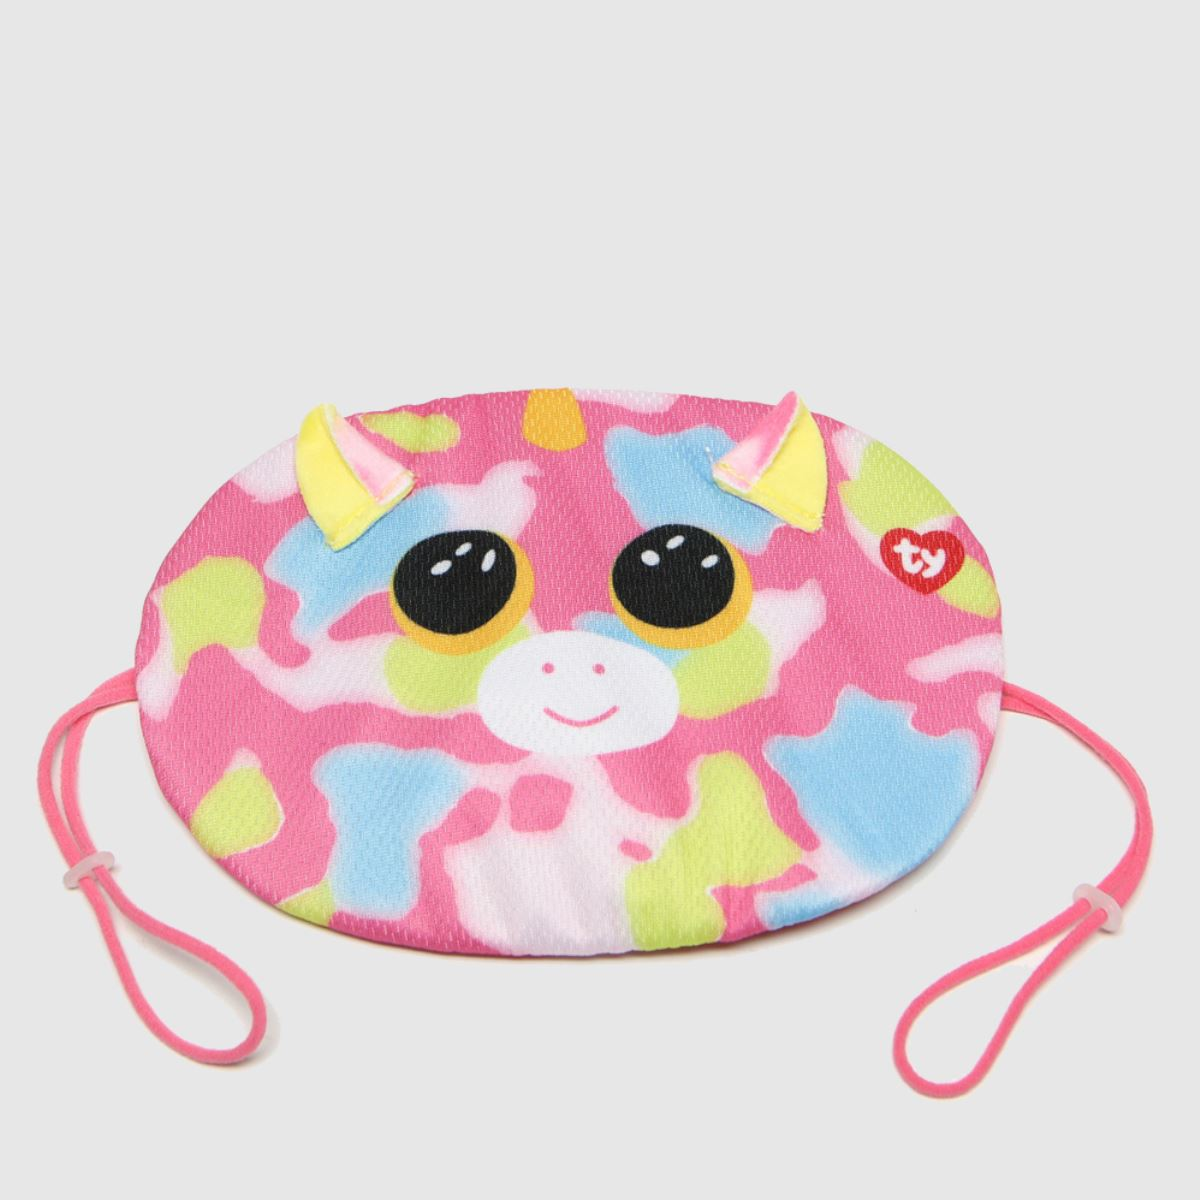 TyUK Pink Mask Fantasia